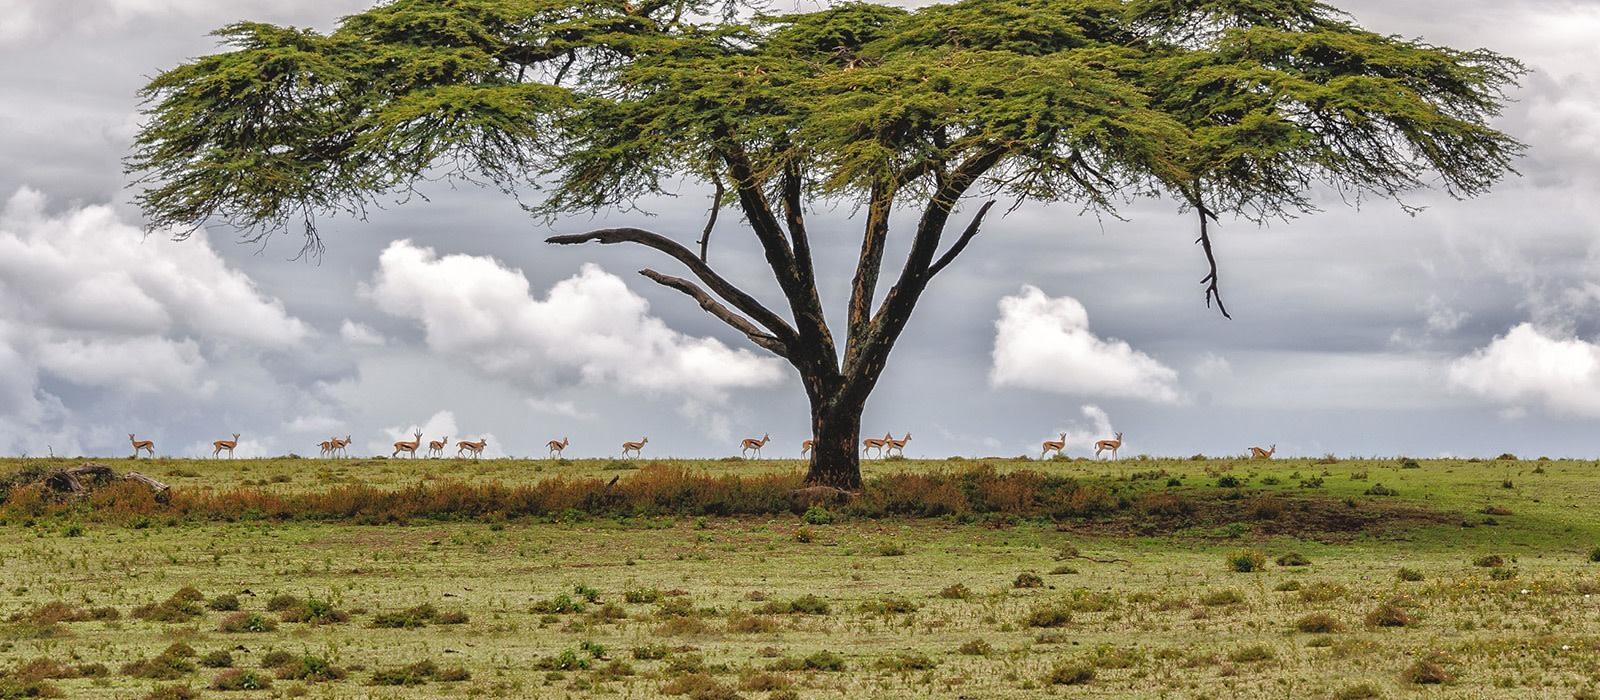 Nairobi - History of Kenya